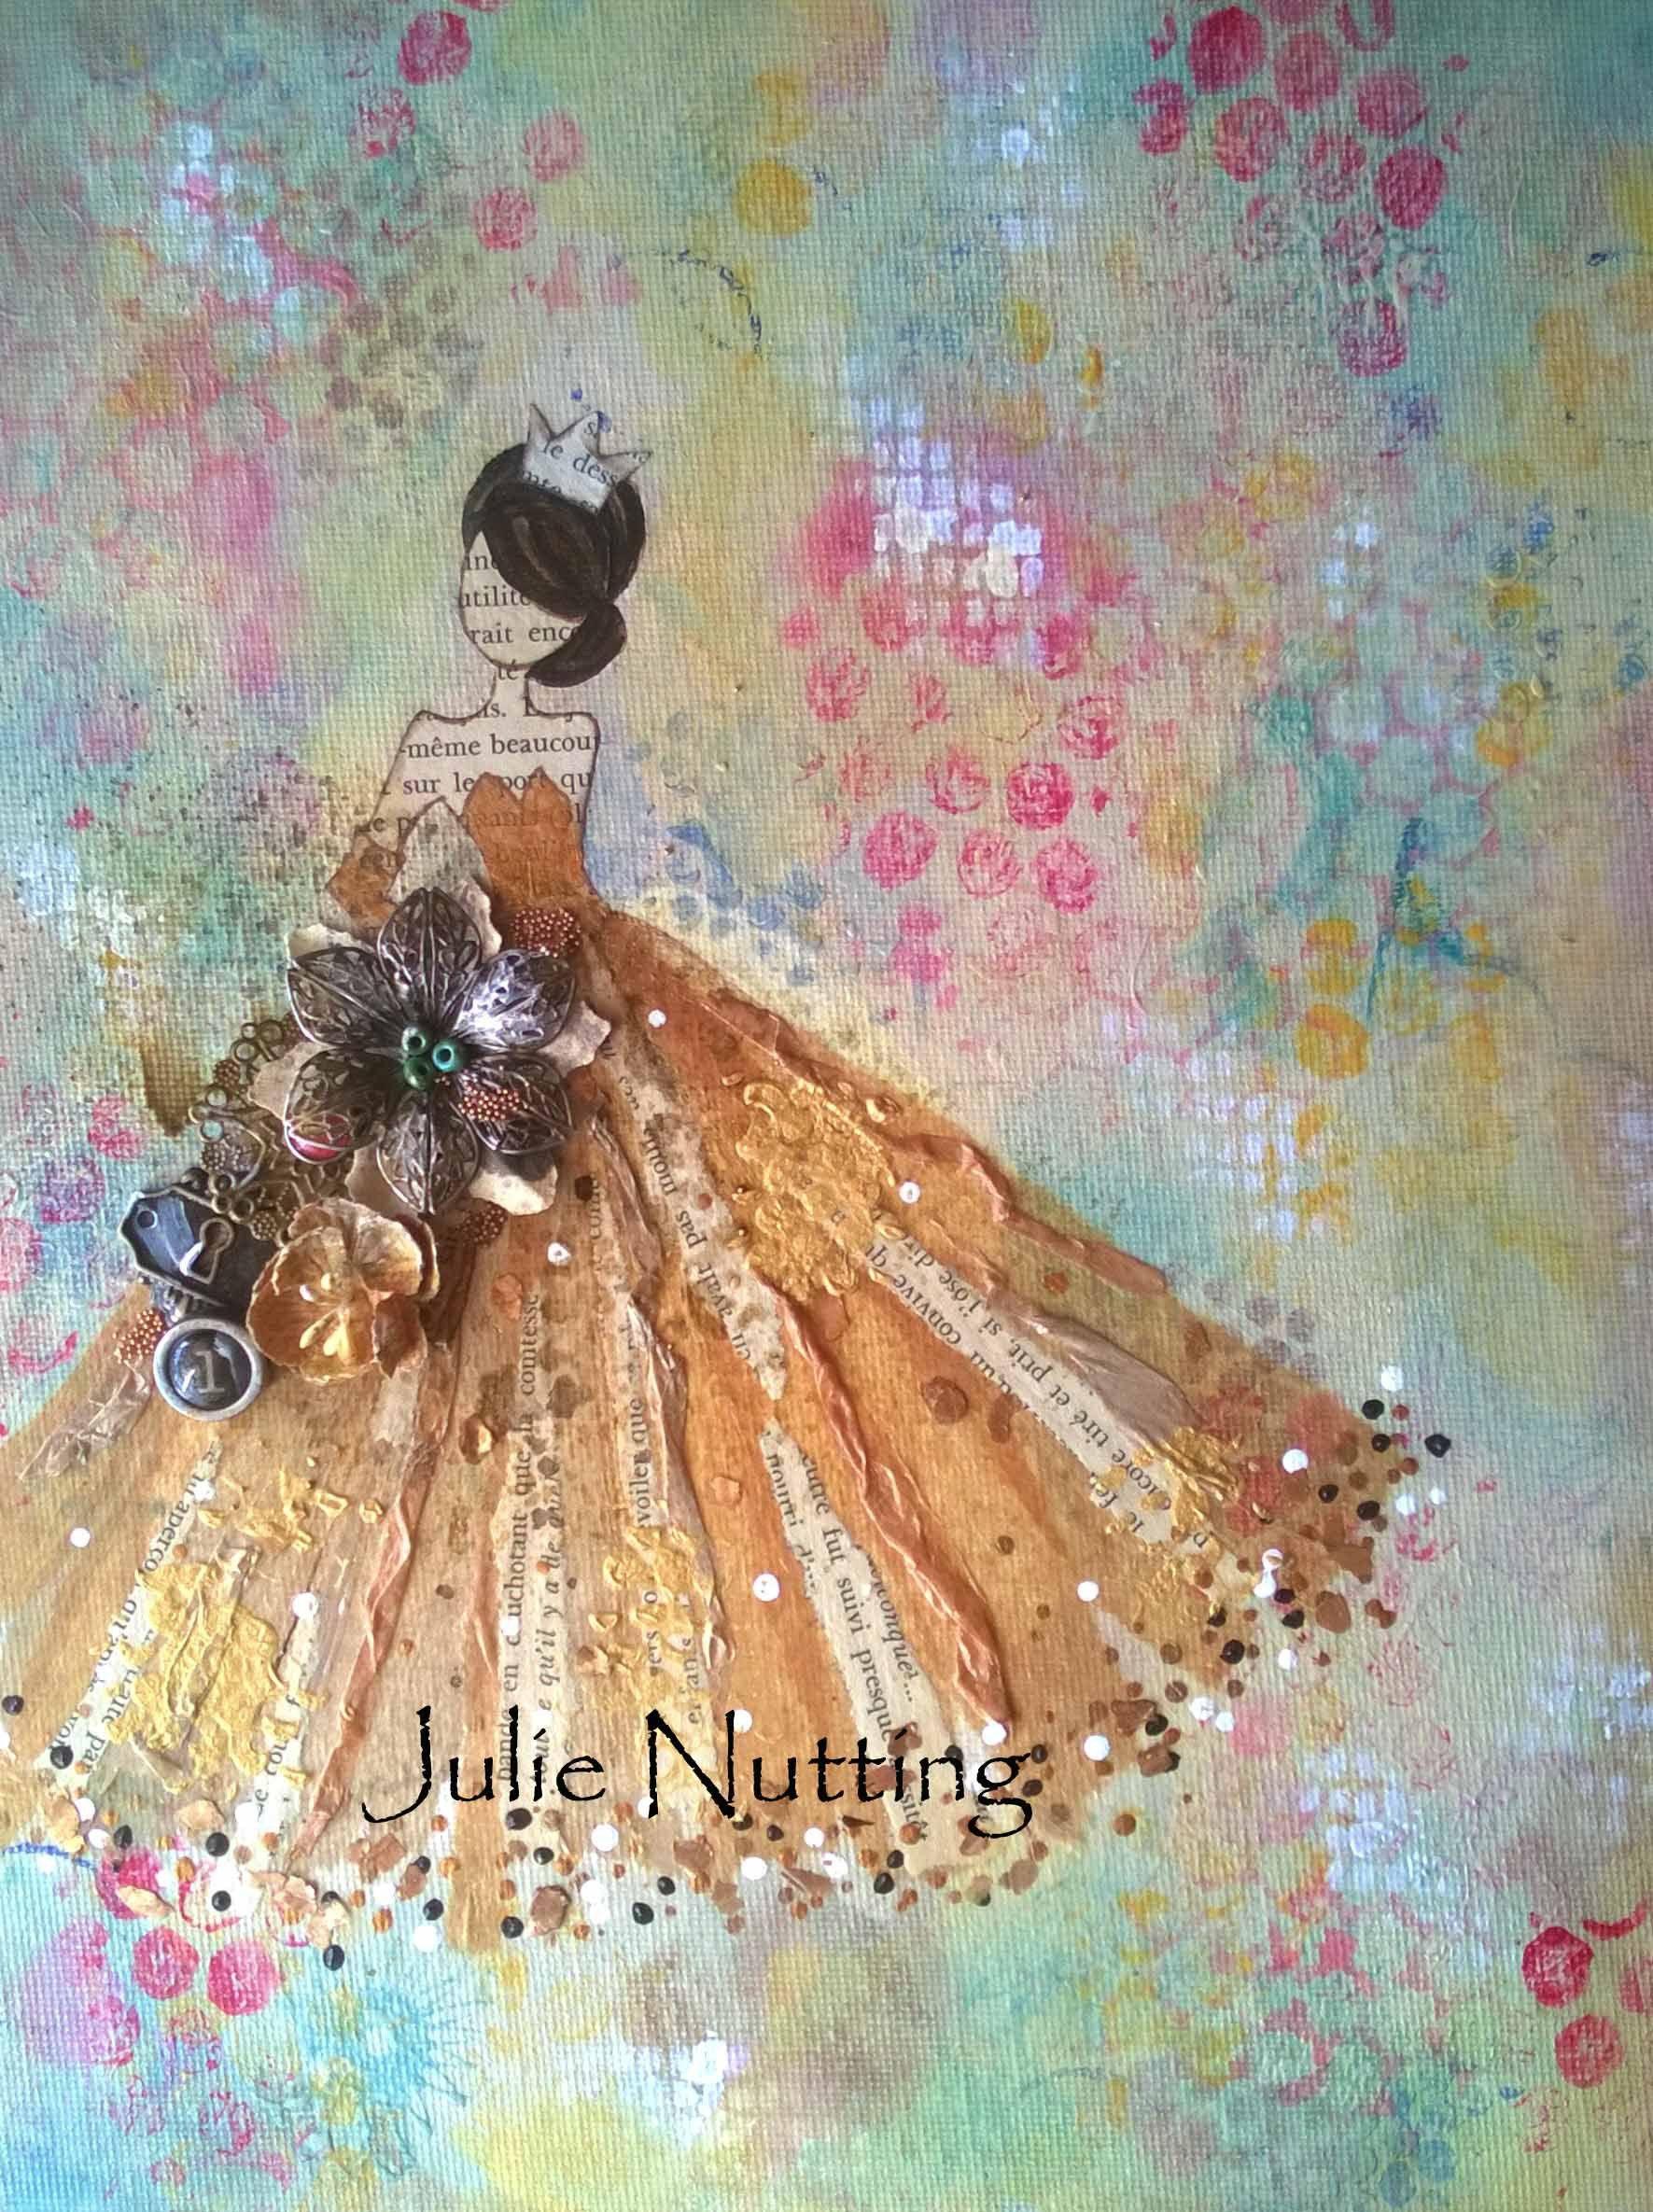 julie ntting everything scrapbook & Stamps